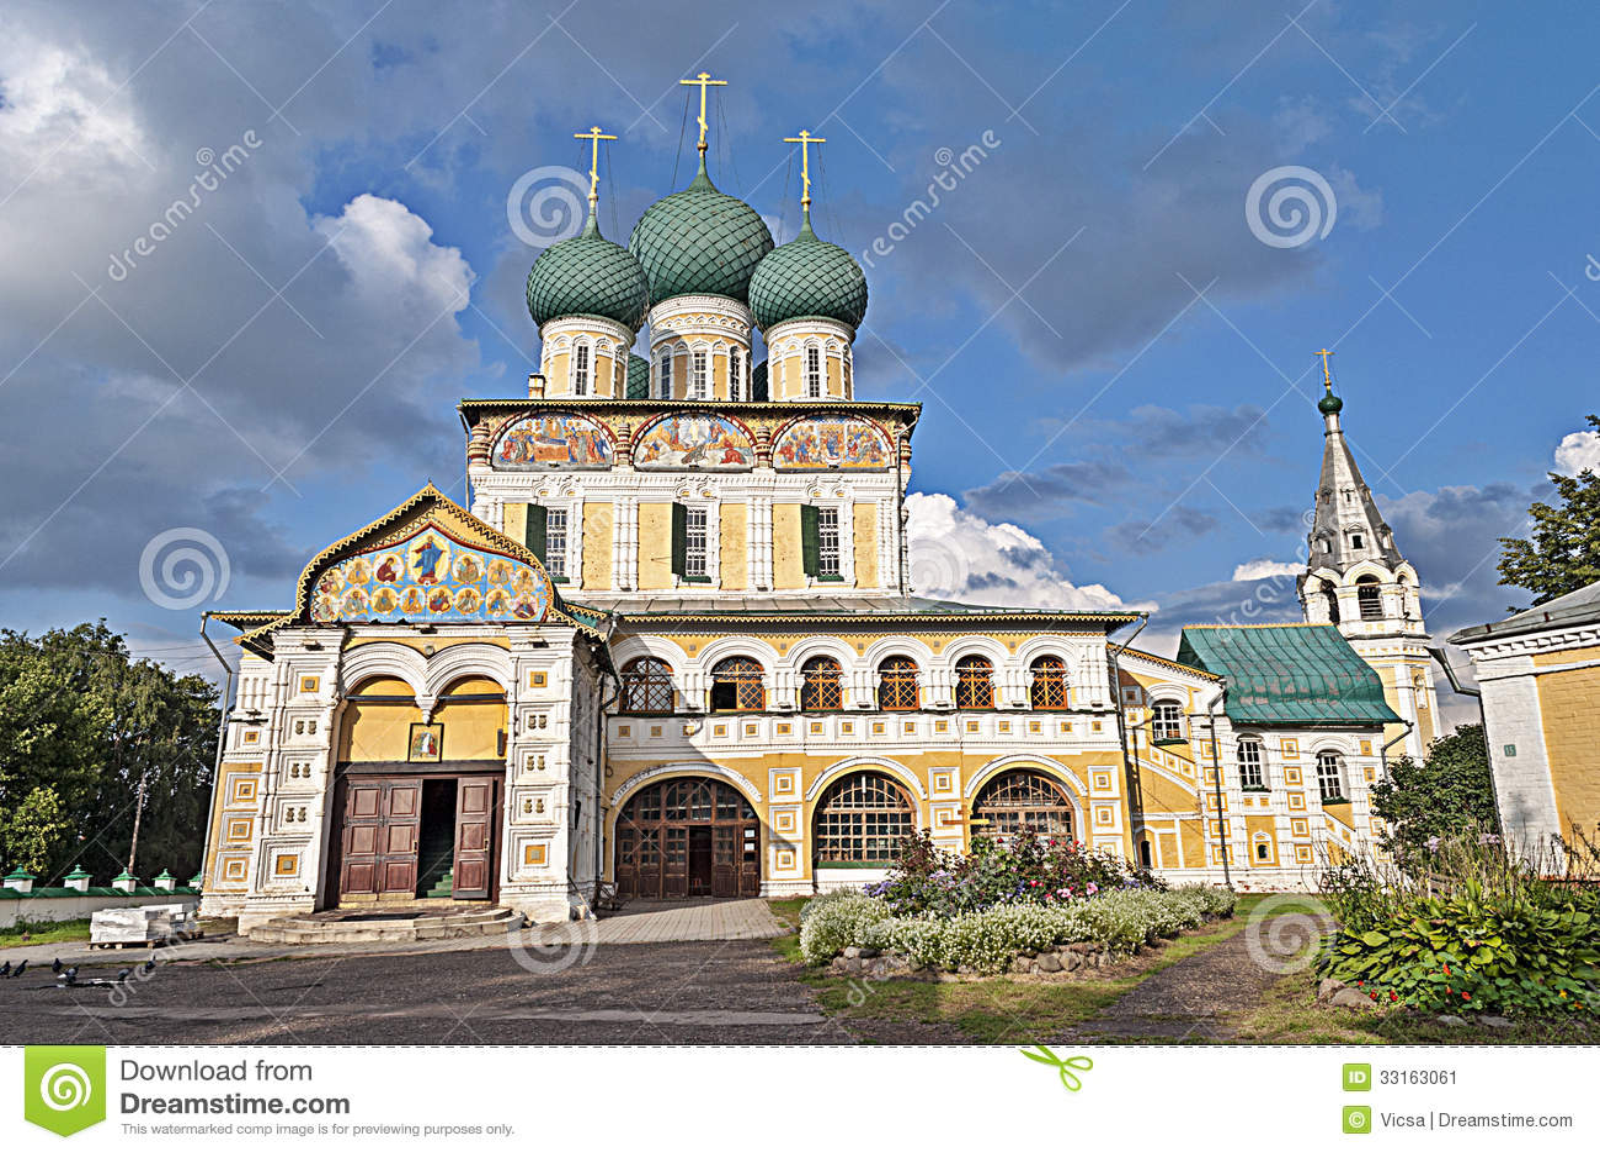 Resurrection Cathedral Tutaev: photos, address and history 35